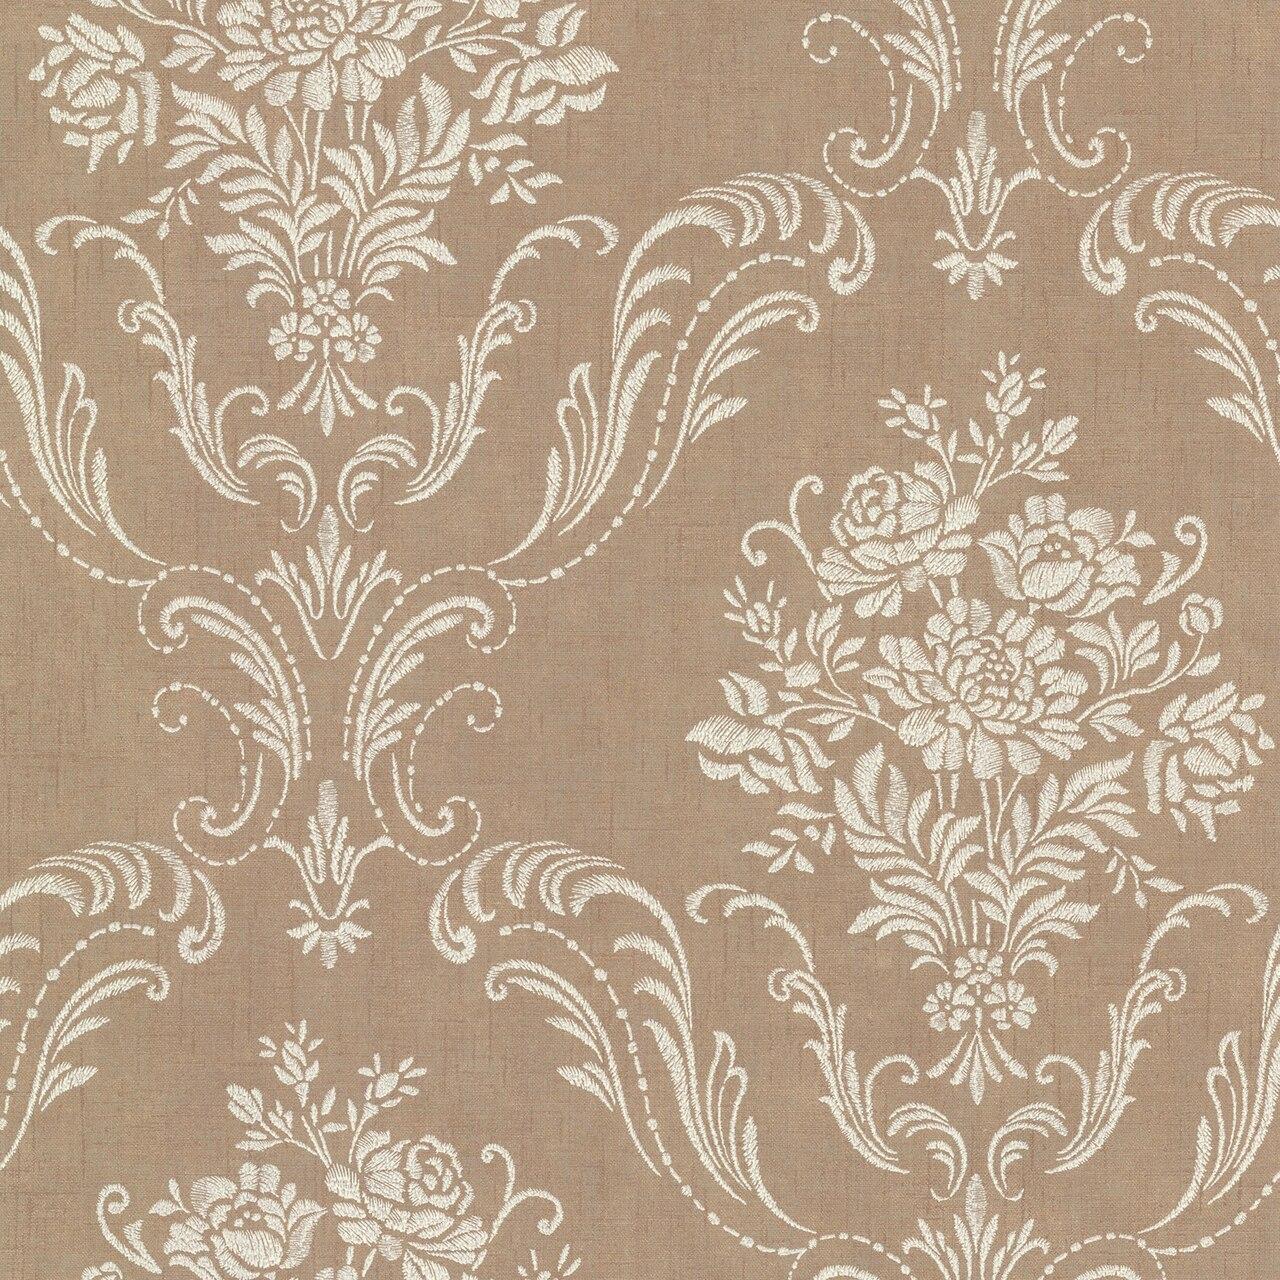 Brewster 2665 21444 Avalon Manor Copper Floral Damask Wallpaper 1280x1280